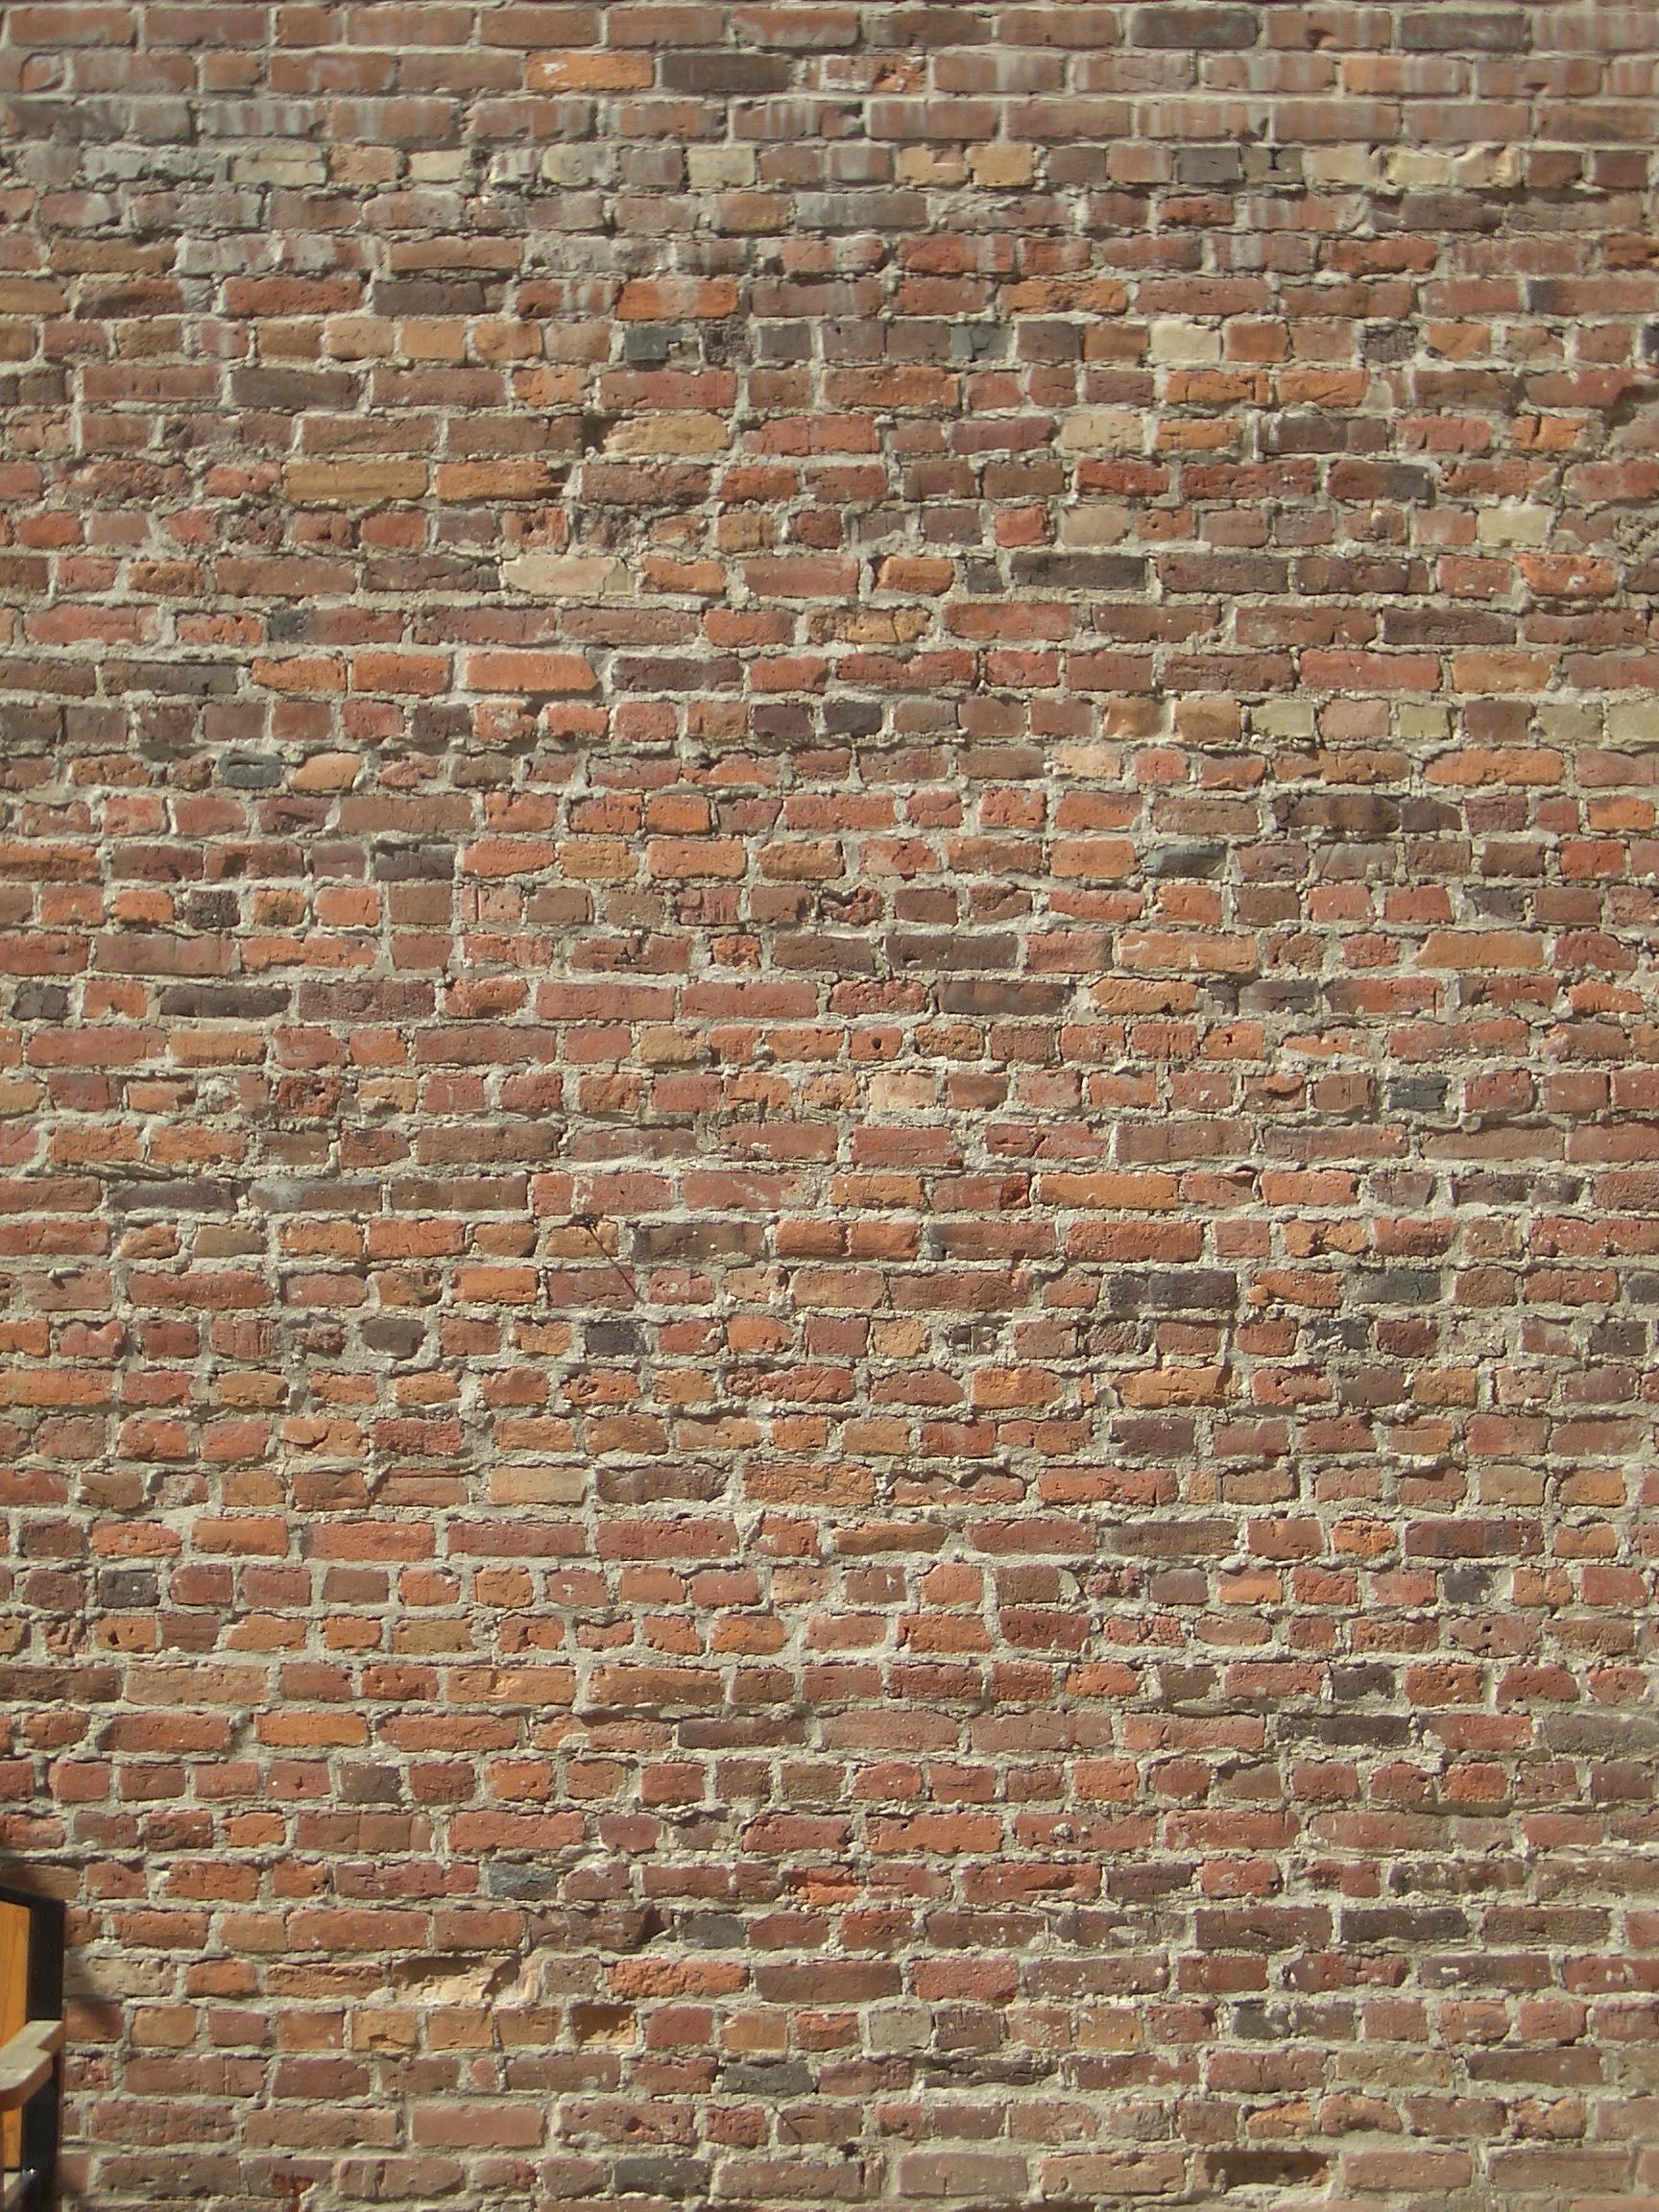 Old Brick Wall 2 Image 375x500 Pixels